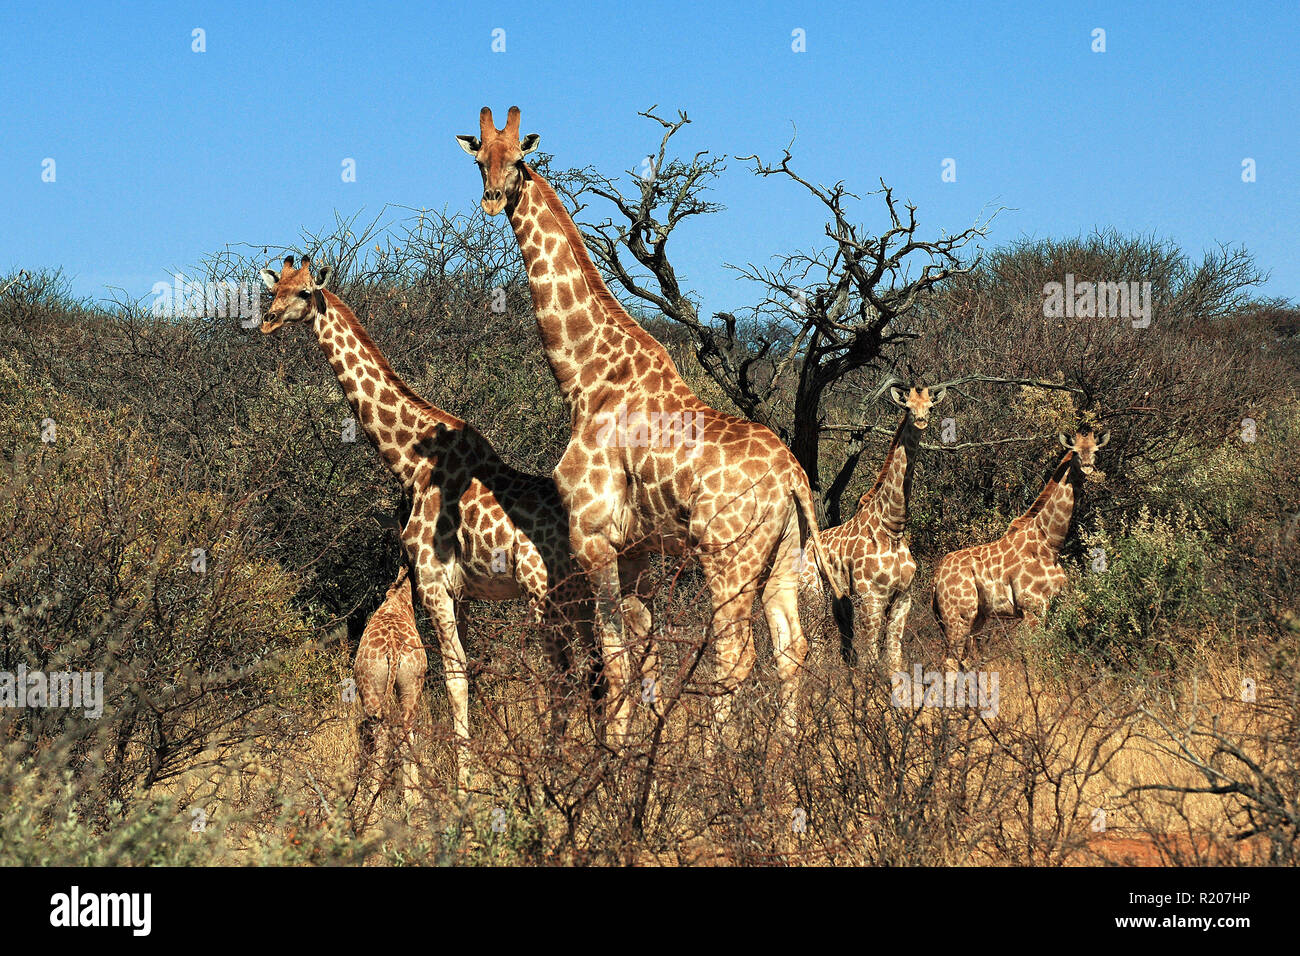 A group Angolan giraffes or Namibian giraffes (Giraffa camelopardalis angolensis) with calf at savanna, Etosha Nationalpark, Namibia, Africa - Stock Image